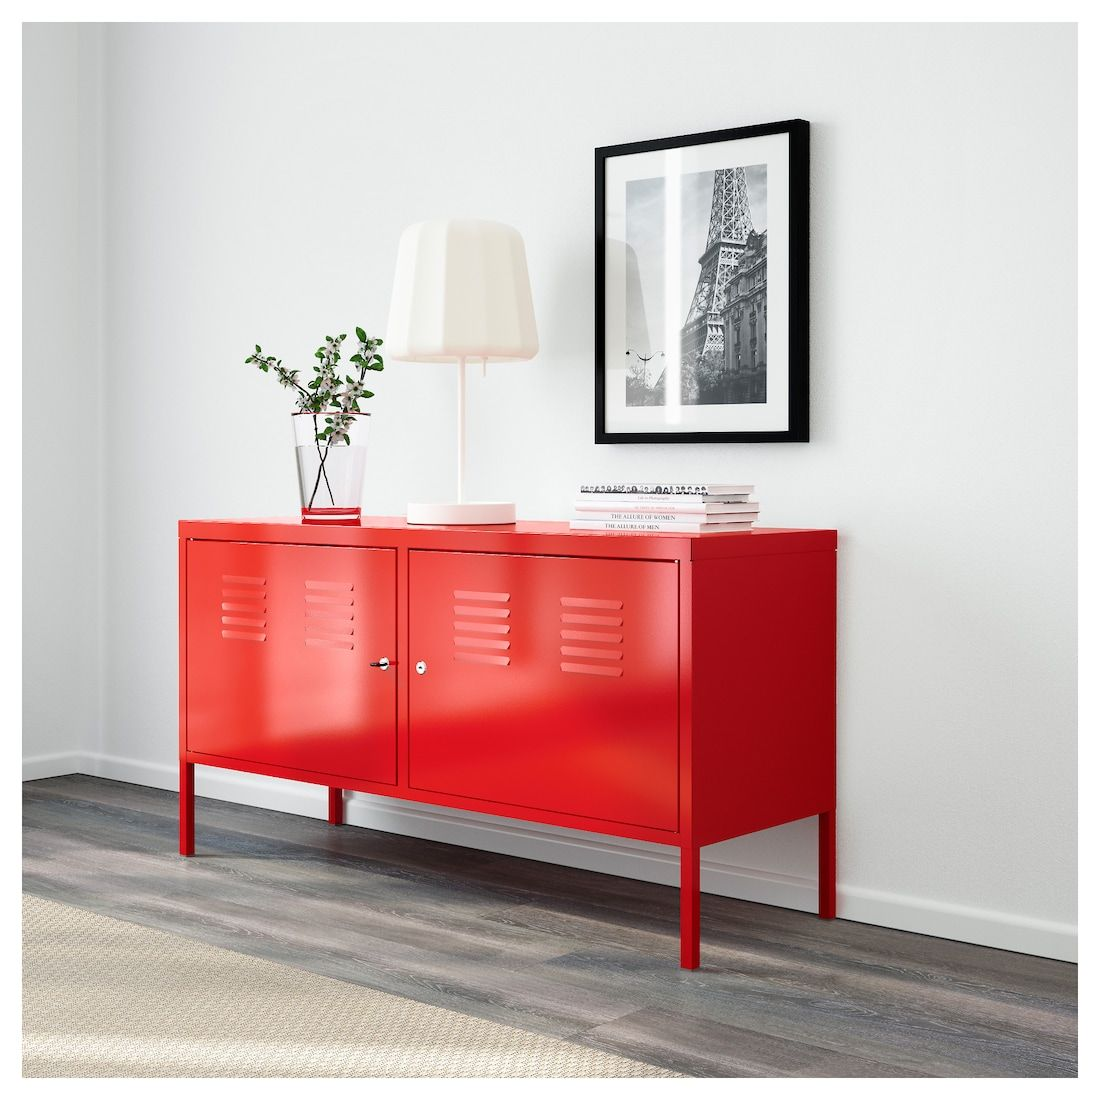 Ikea Ps Cabinet Red 46 7 8x24 3 4 Ikea Armoire Ikea Ps Armoire Metallique Meuble Metal Ikea